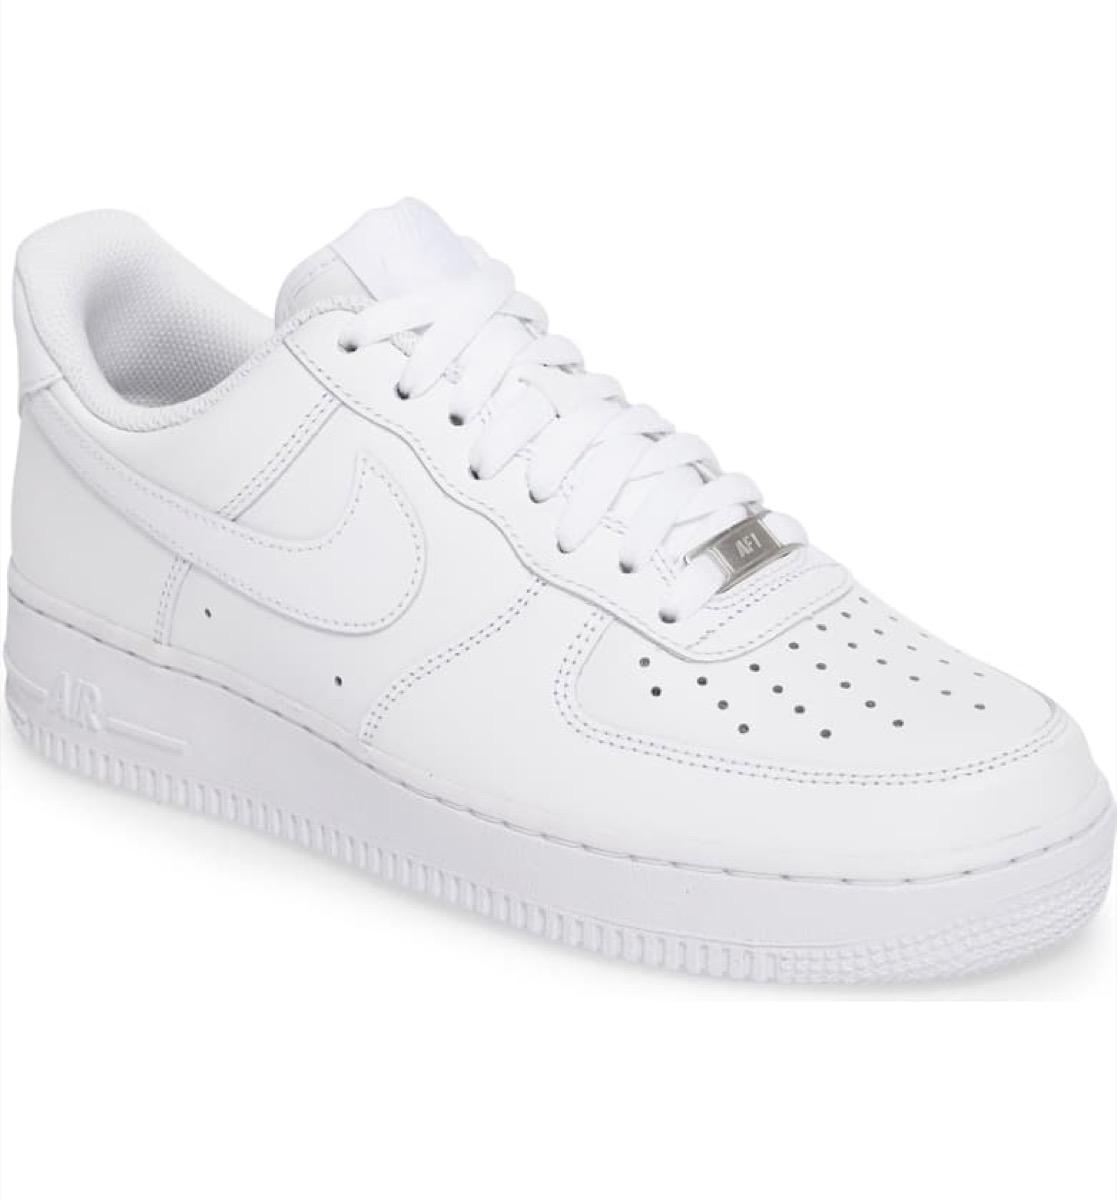 Air Force 1s Nike